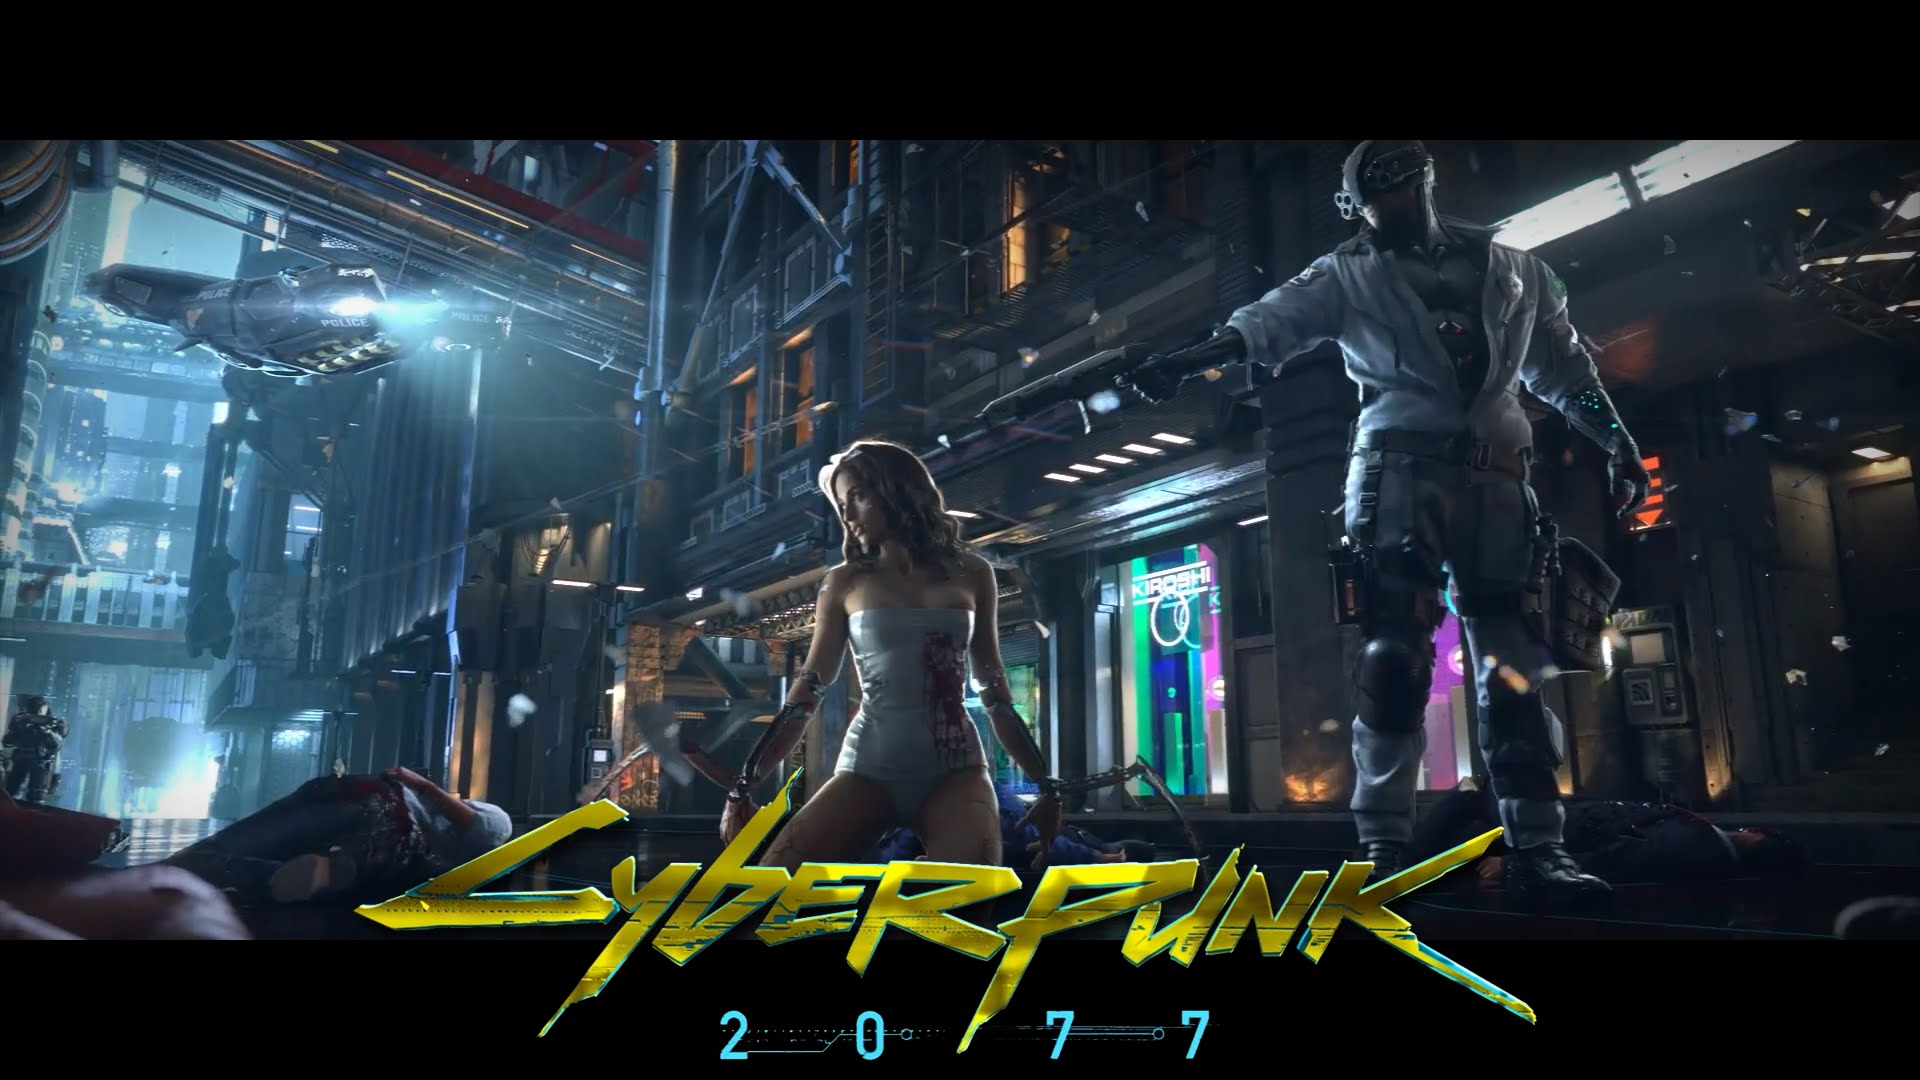 Хакеры украли раннюю версию Cyberpunk 2077